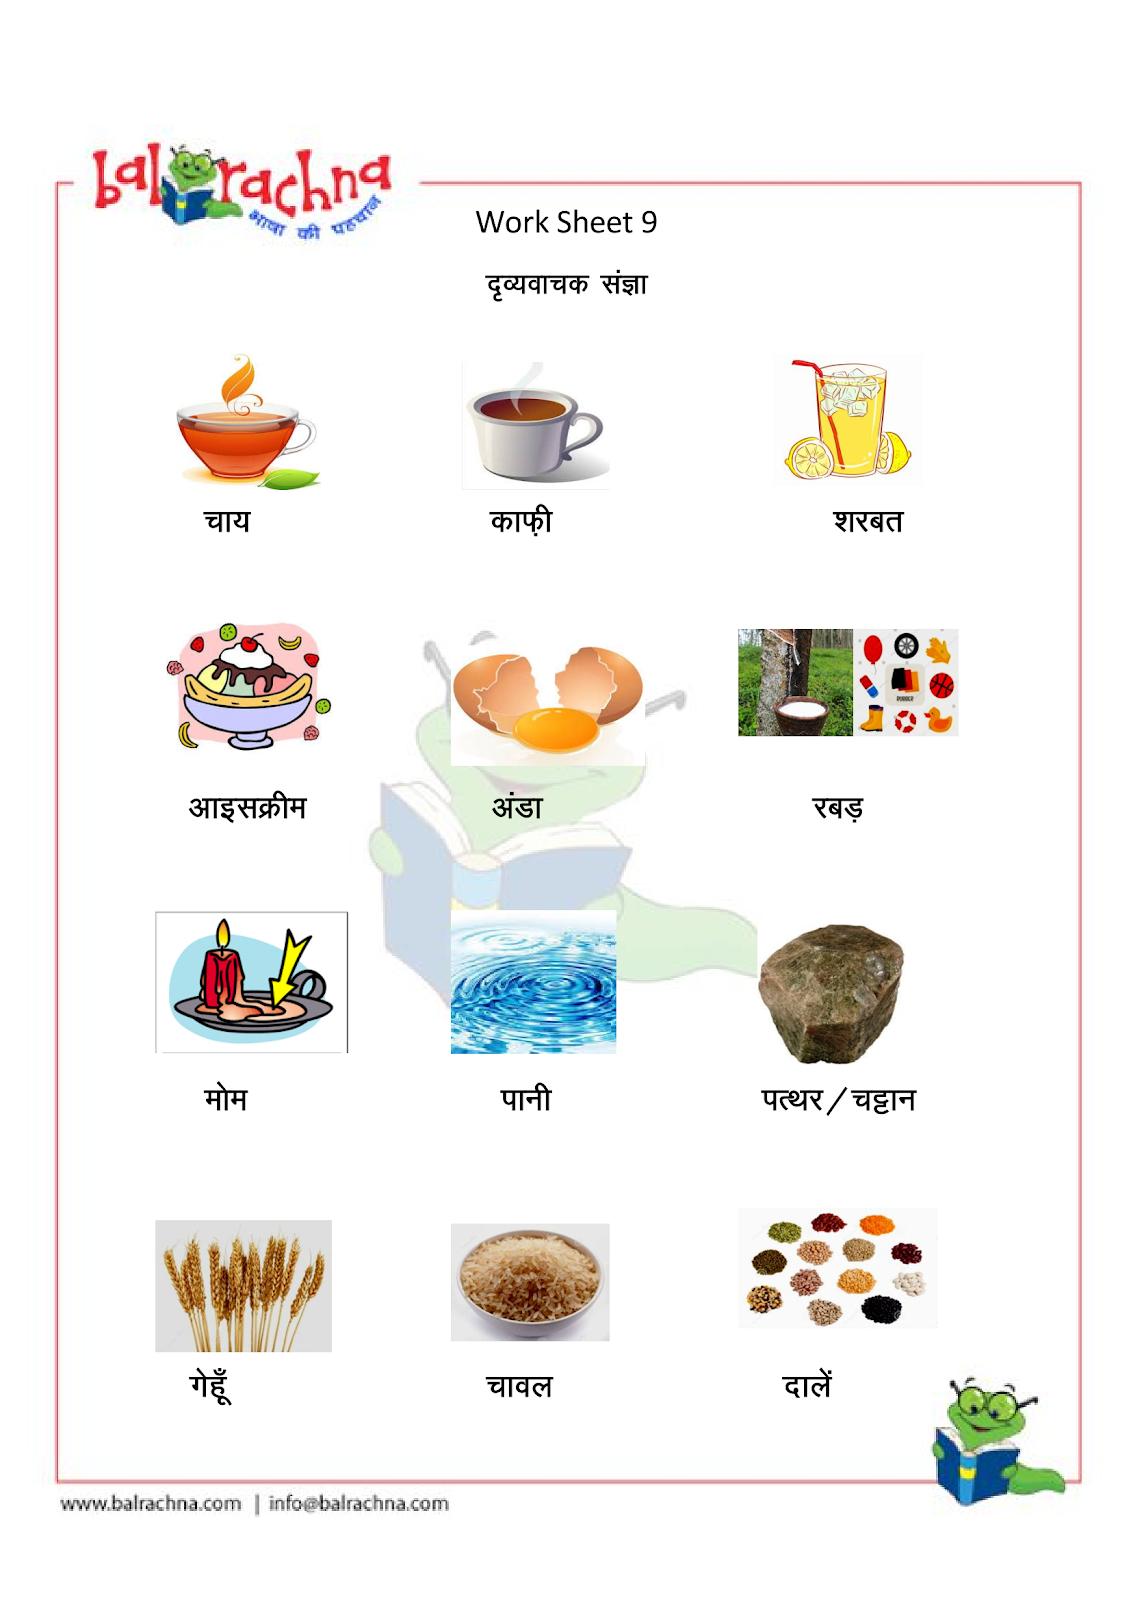 Balrachna Words Pictorial Worksheets